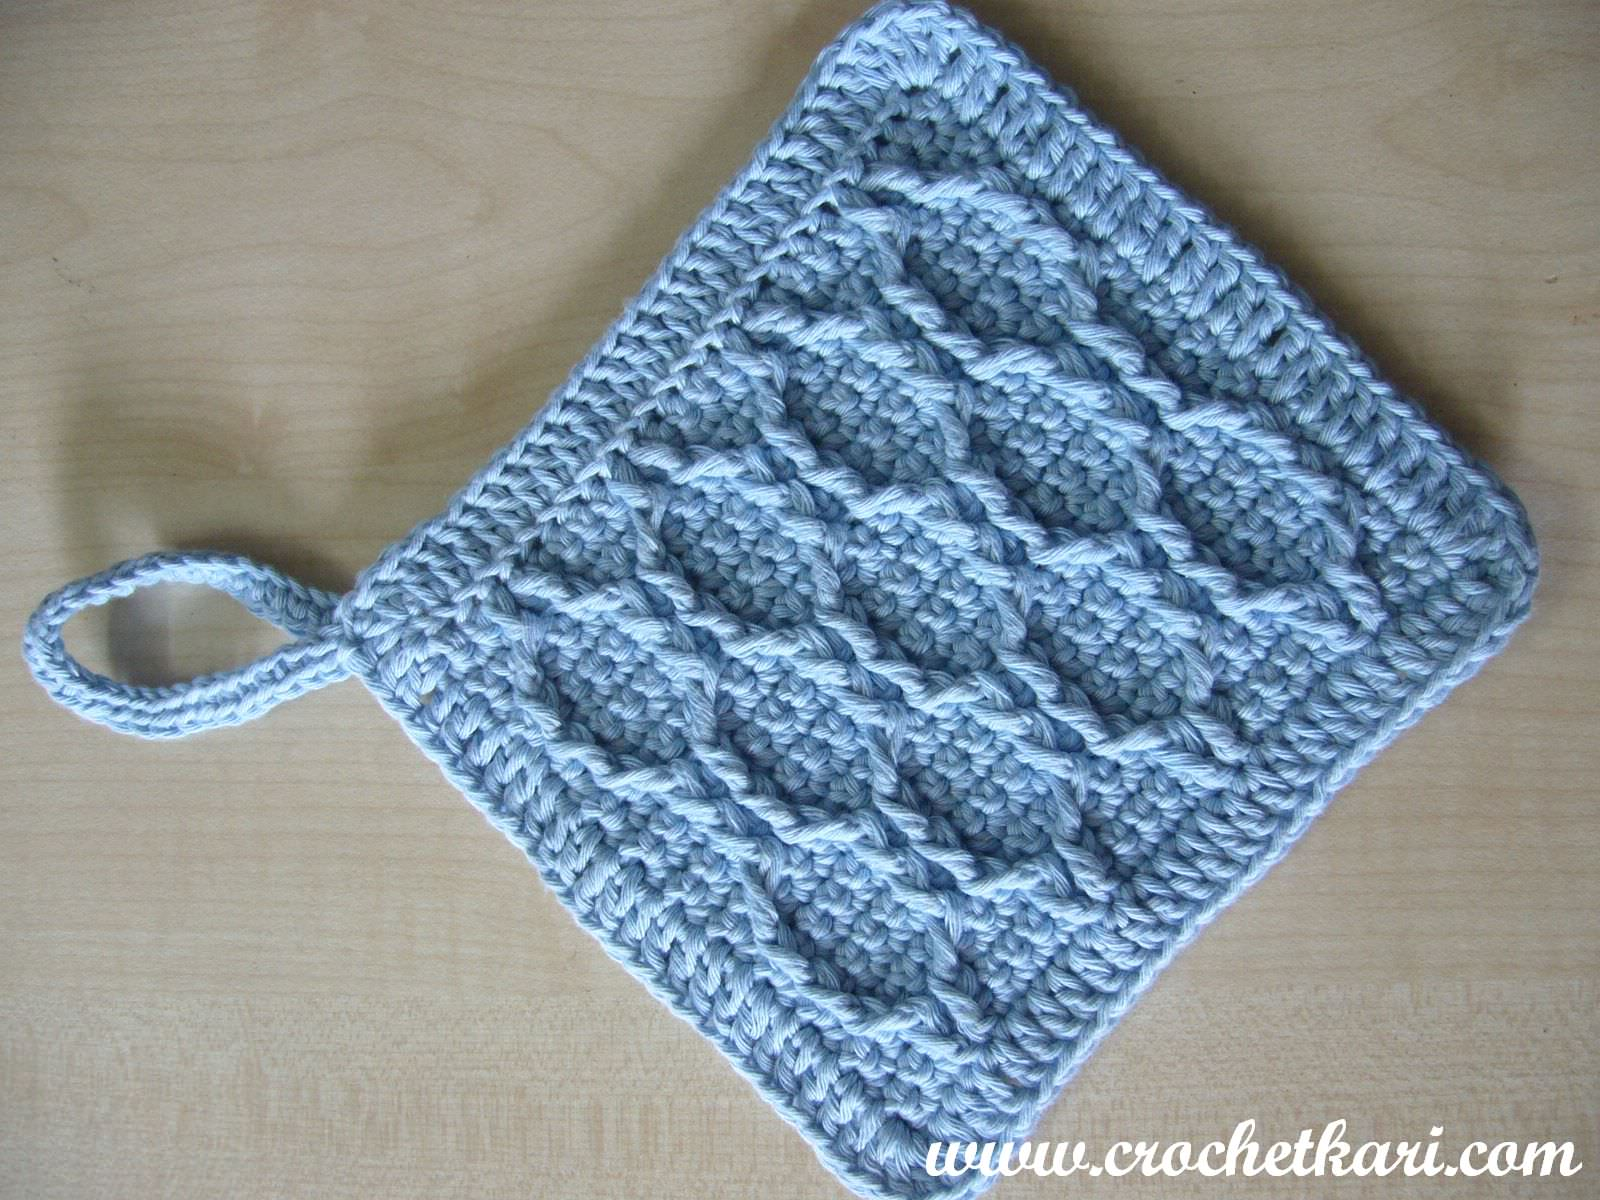 Crochetkari: Crochet Honeycomb Washcloth